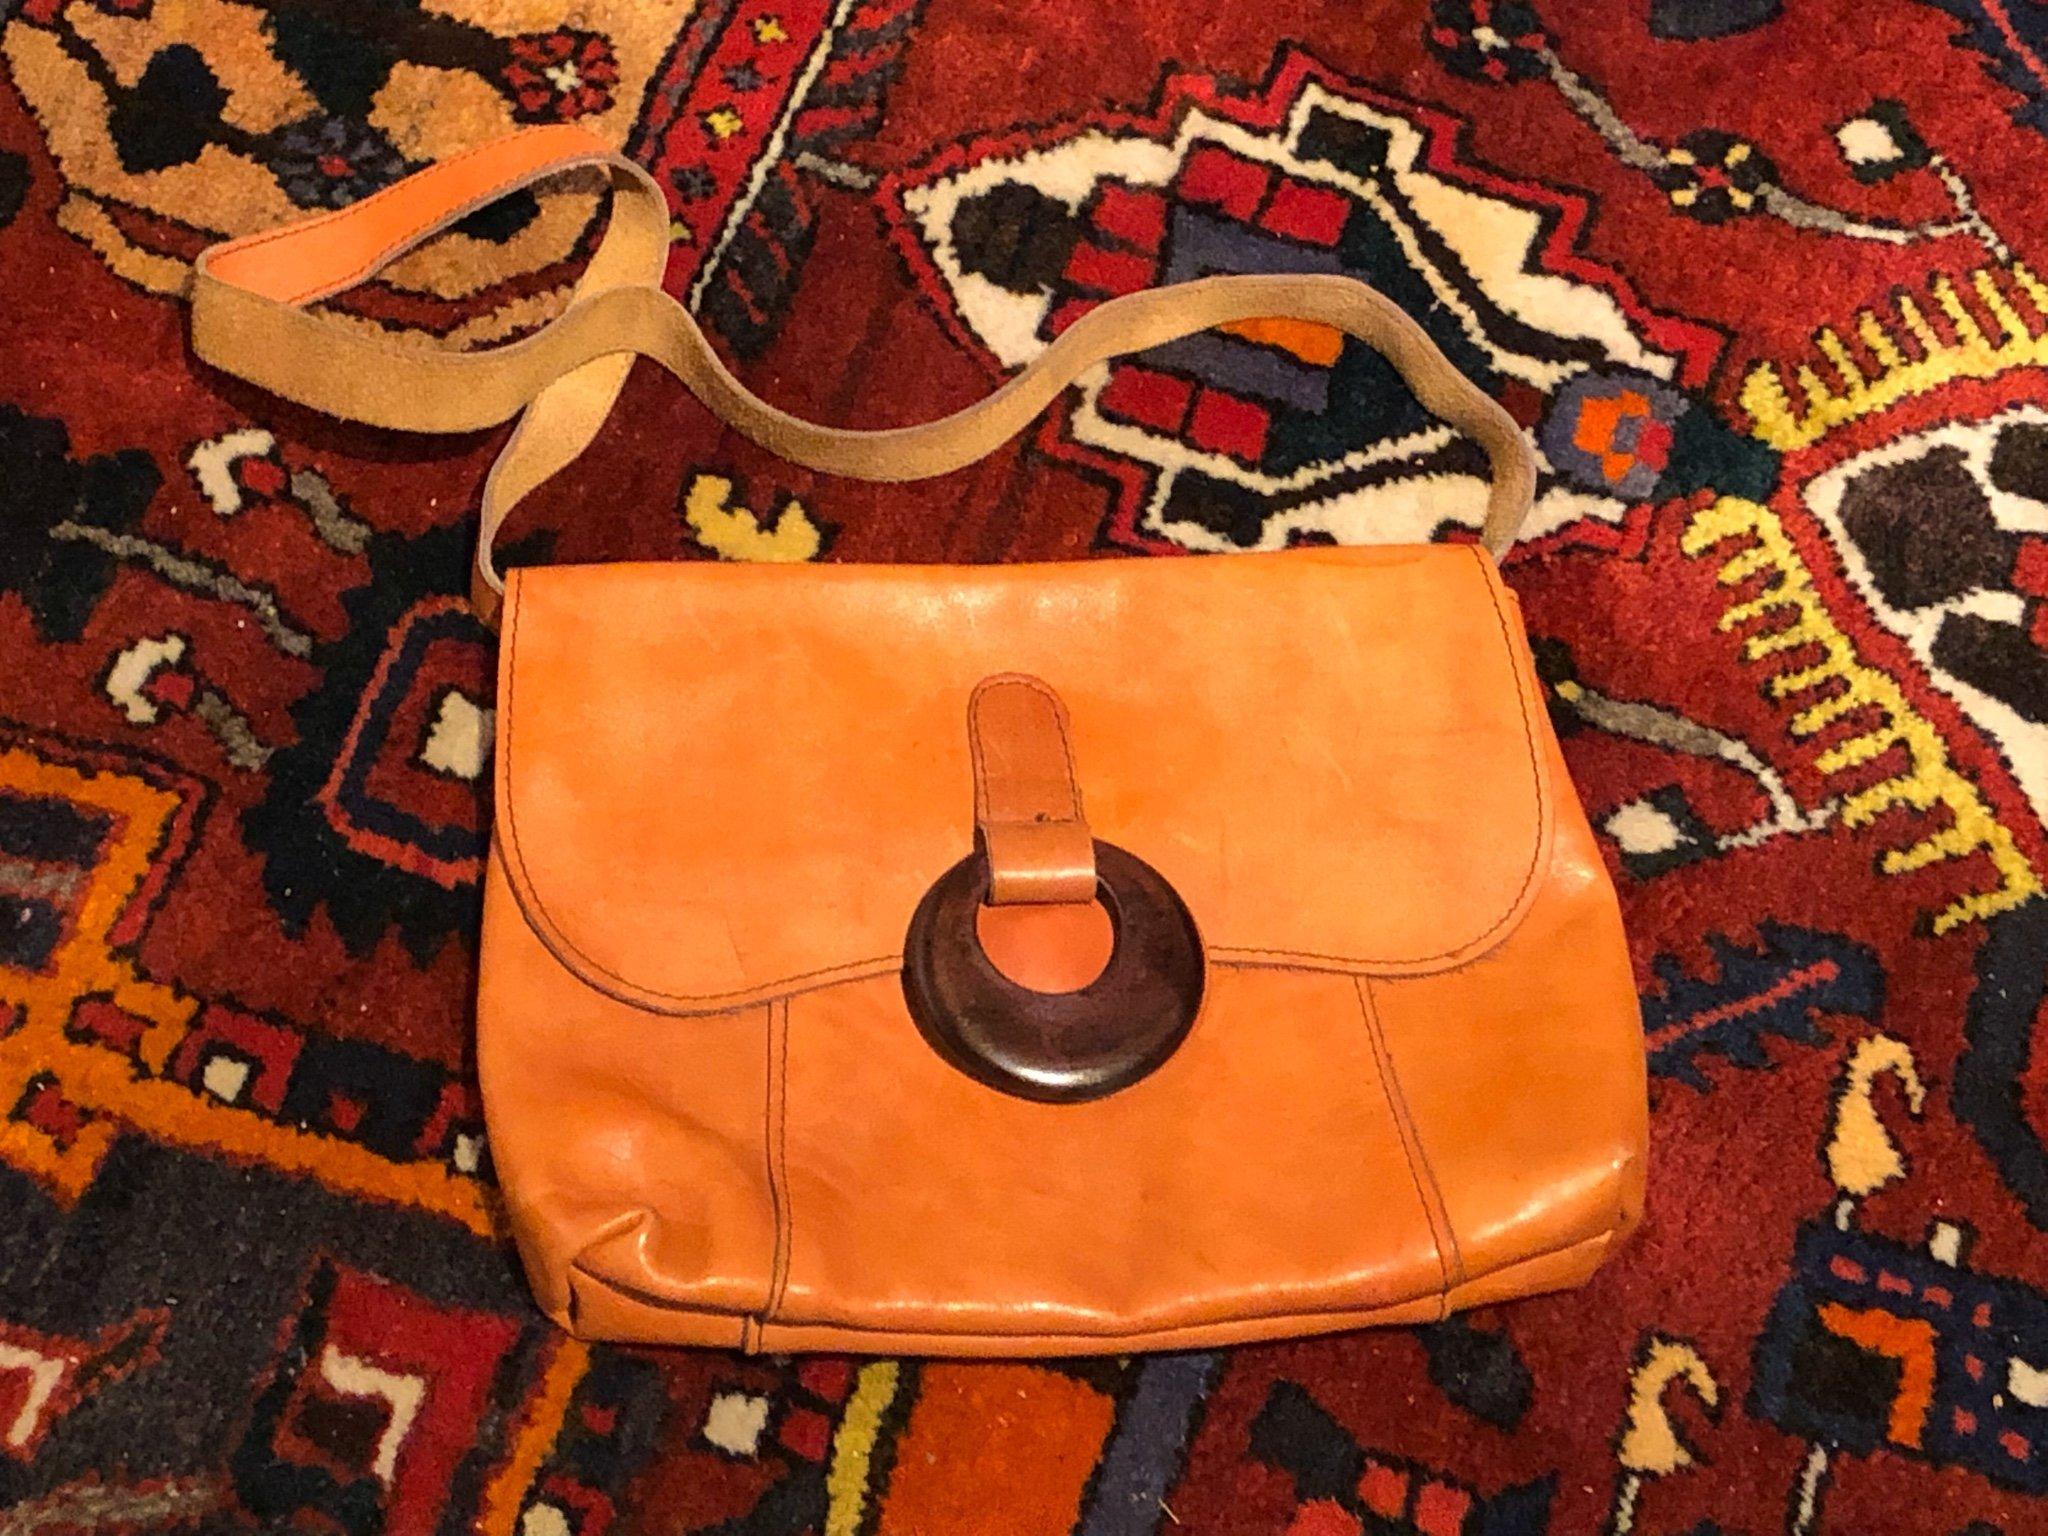 Retro vintage väska axelremsväska skinn läder